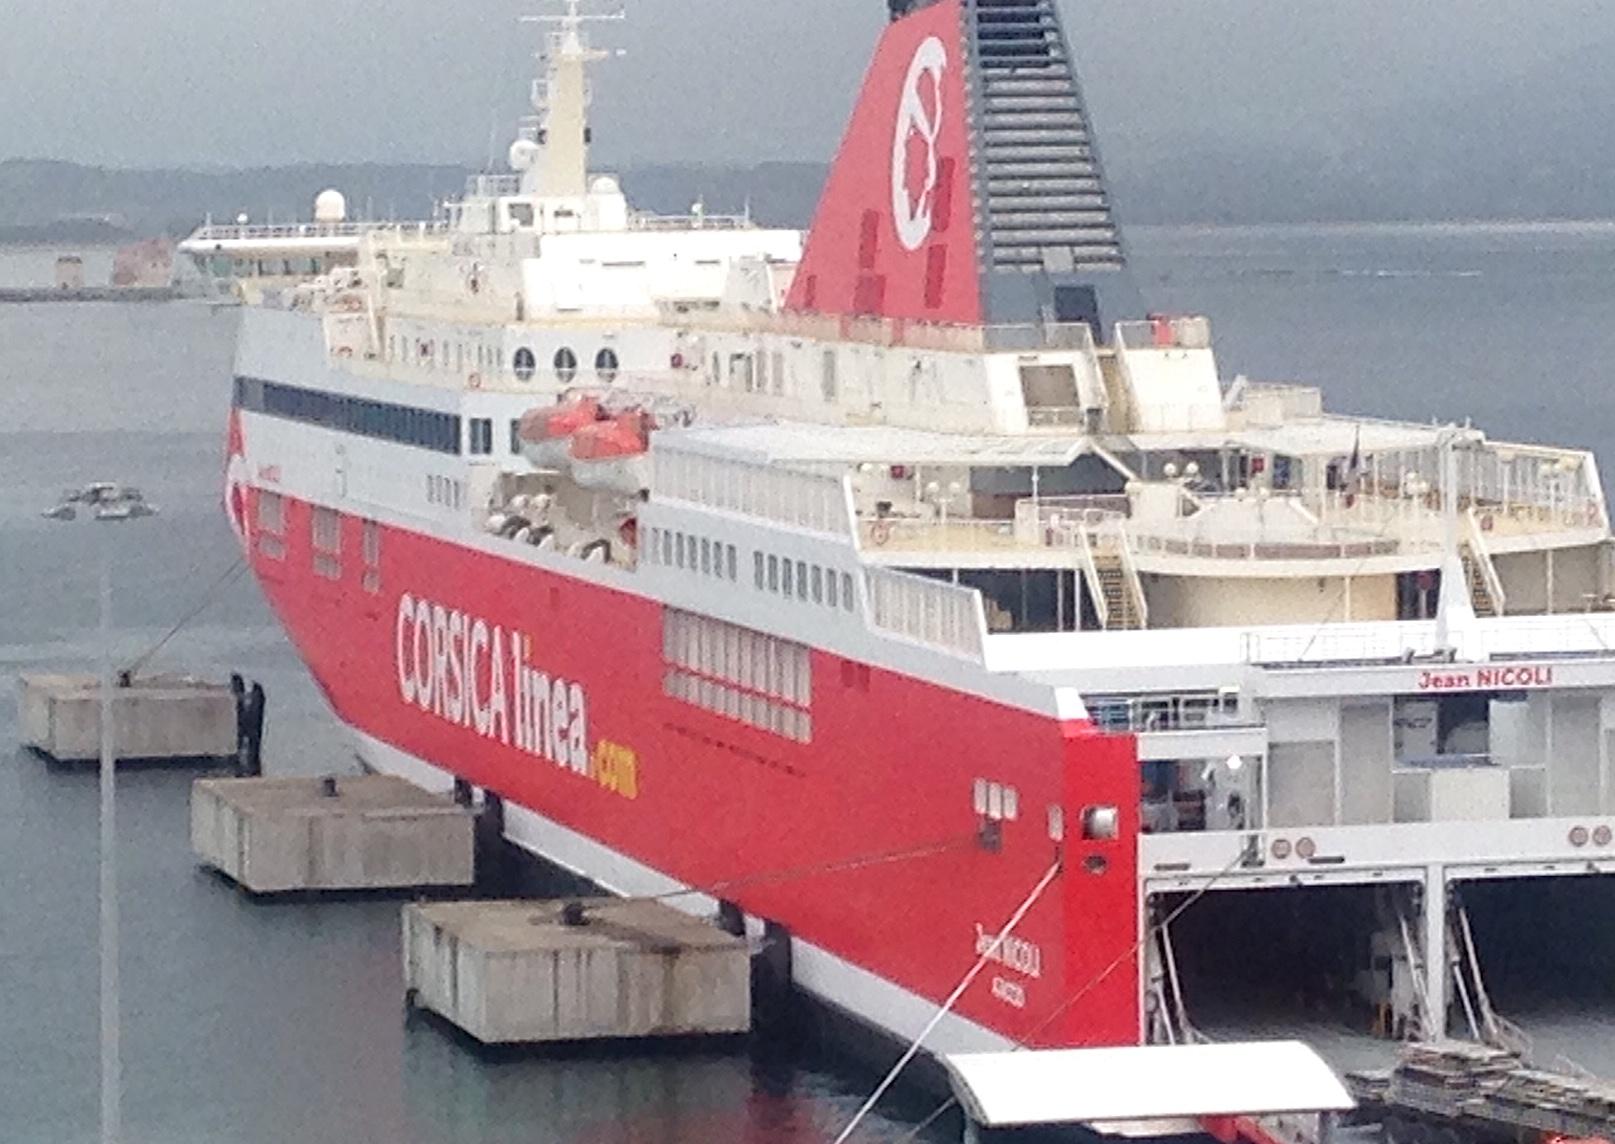 Le Jean-Nicoli version Corsica Linea à Ajaccio : Le rouge est mis